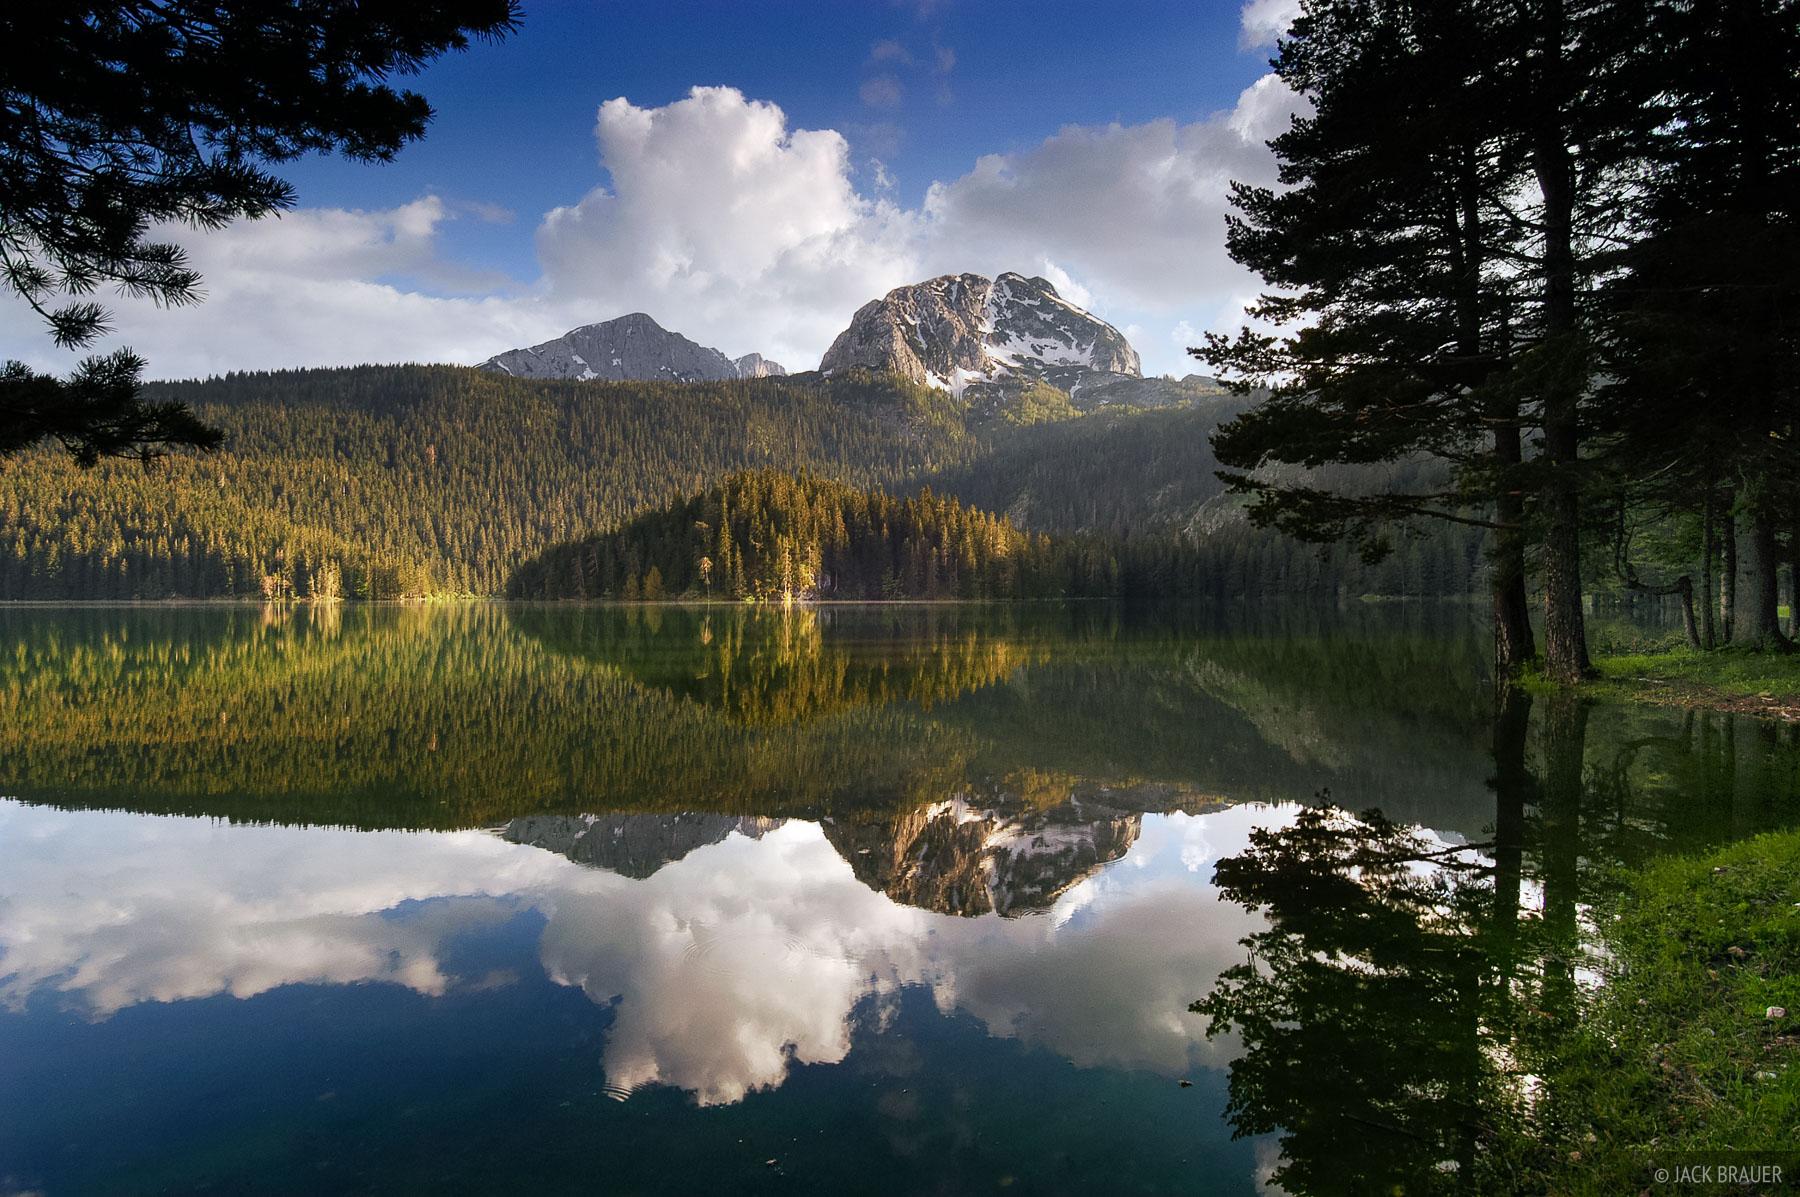 Medjed, Crno Jezero, reflection, Durmitor National Park, Montenegro, photo